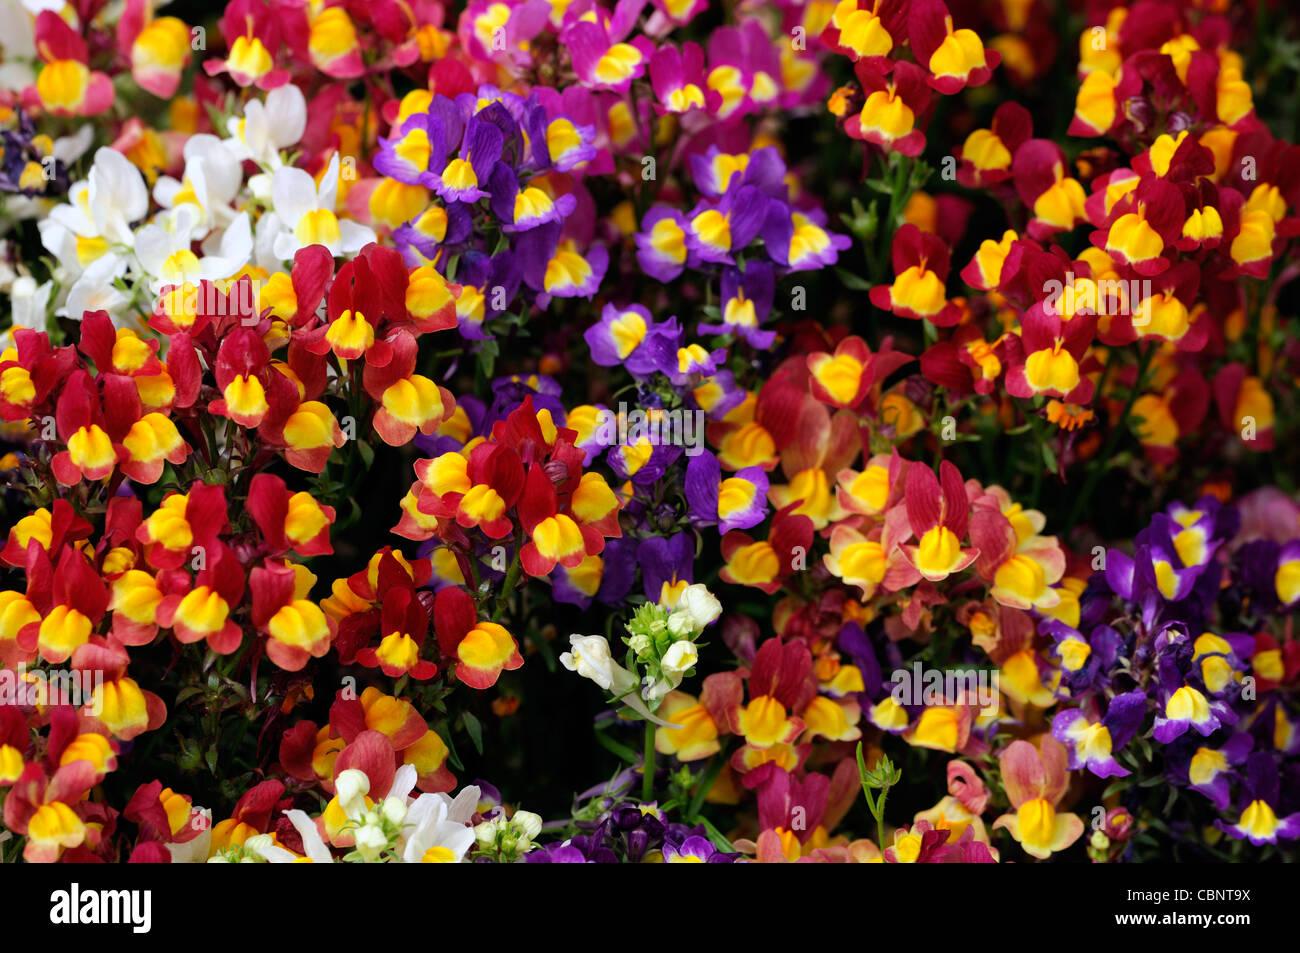 Linaria maroccana fantasy mix delicate dwarf bright bi coloured linaria maroccana fantasy mix delicate dwarf bright bi coloured flowers shades magenta red pink yellow blue white bedding annual izmirmasajfo Choice Image